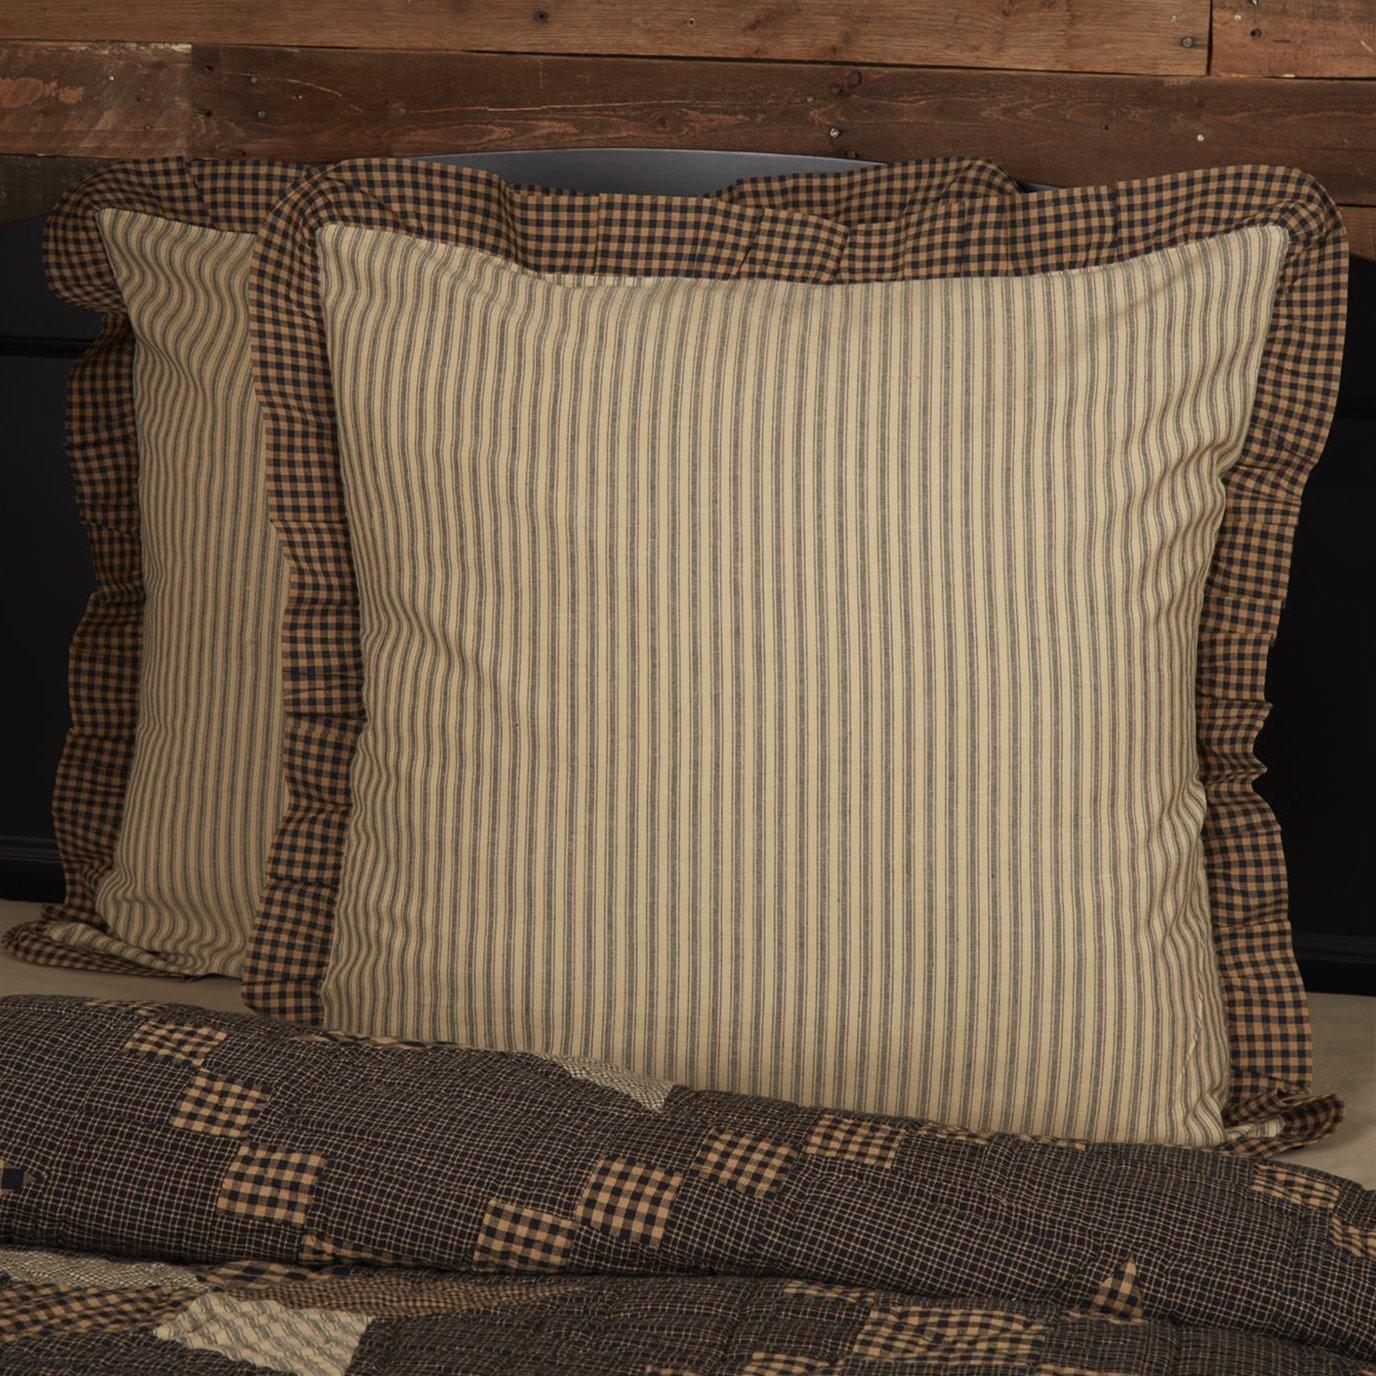 Farmhouse Star Ticking Stripe Fabric Euro Sham 26x26